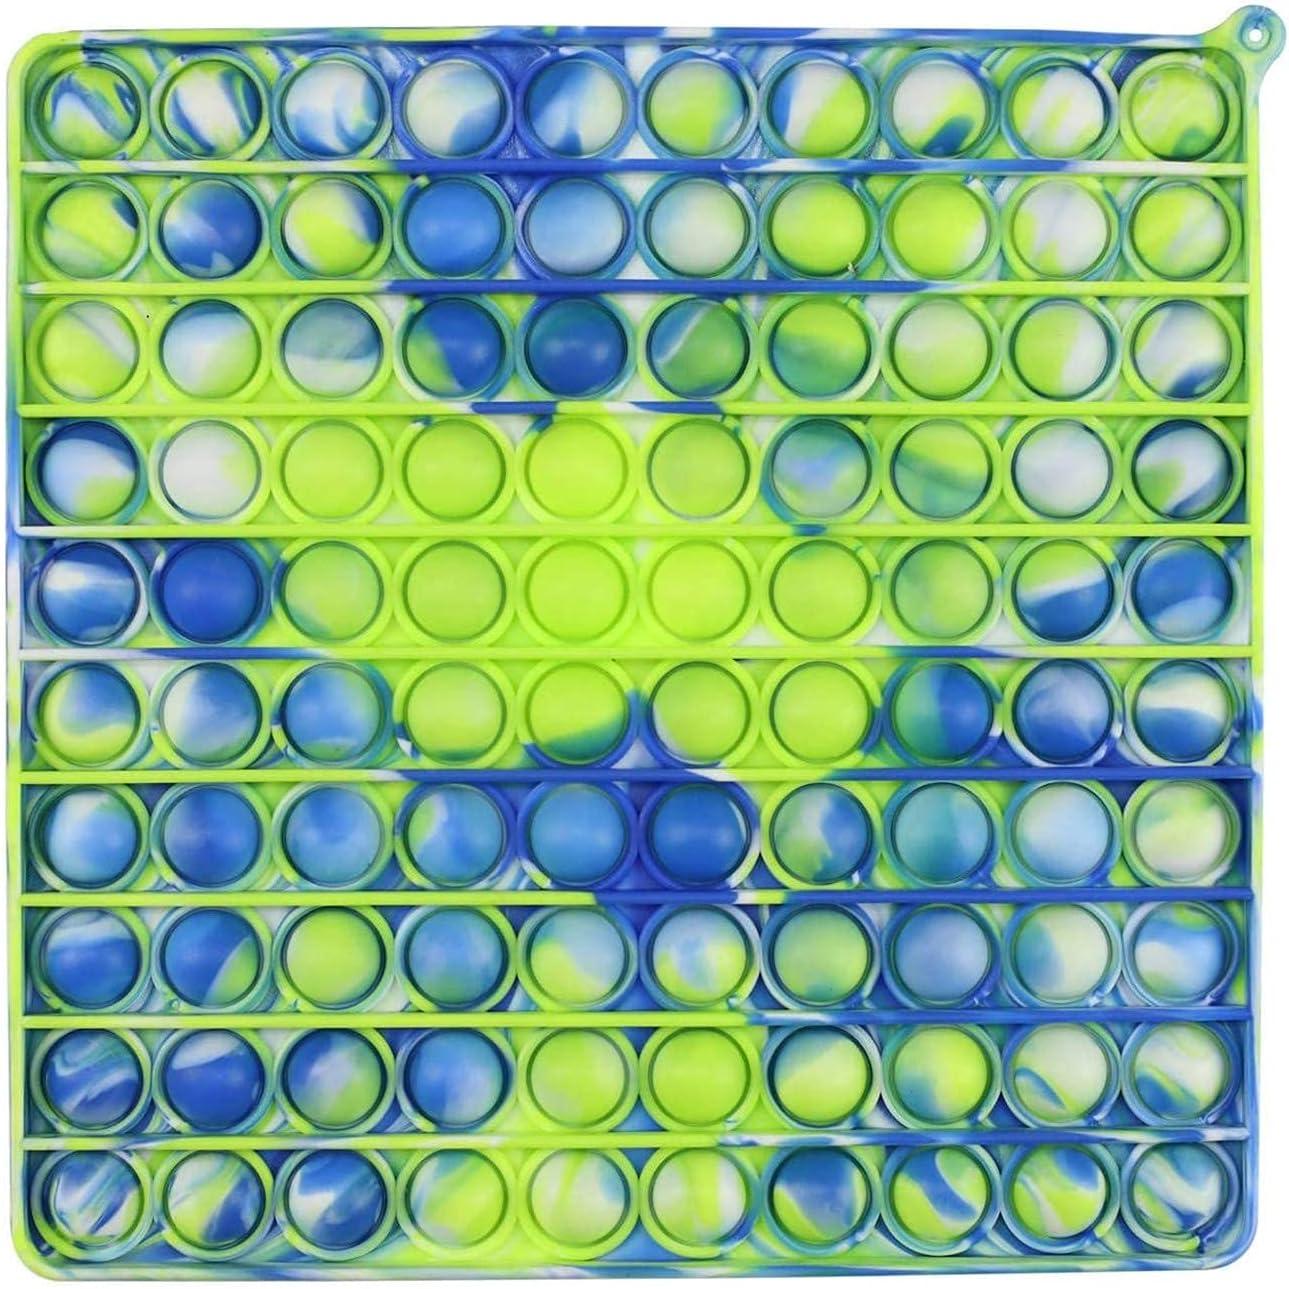 Ynzix Max 84% OFF Big Size Pop Bubble Sensory 100 Bubbles Toys Fidget 2021 new Silico